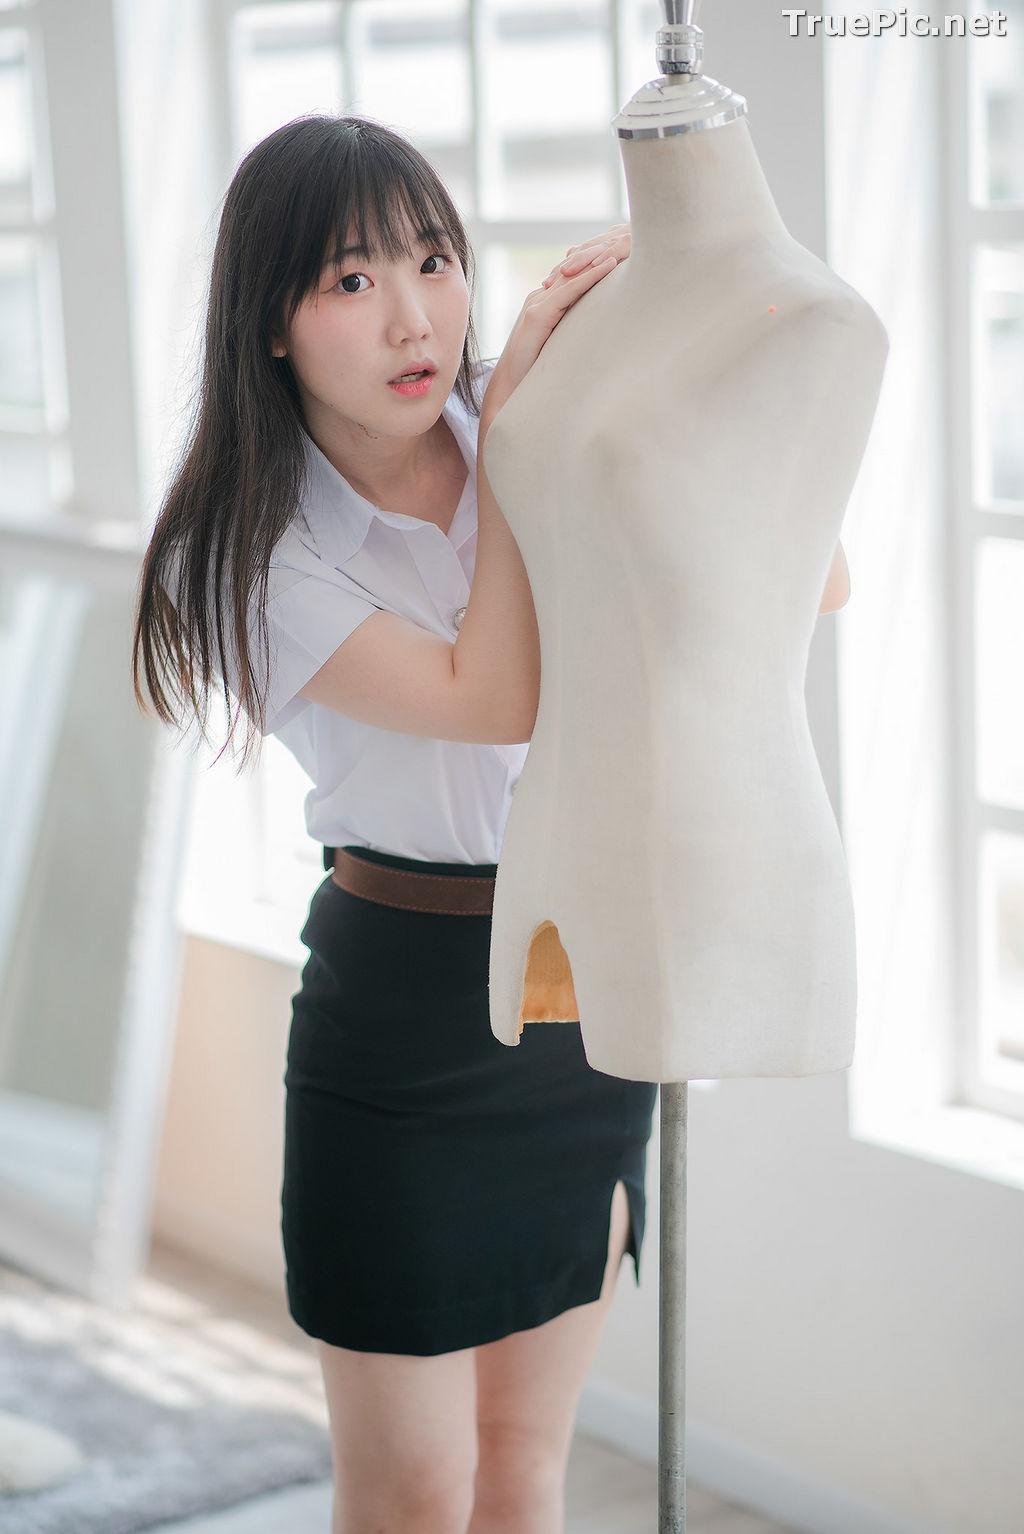 Image Thailand Model - Miki Ariyathanakit - Cute Student Girl - TruePic.net - Picture-8